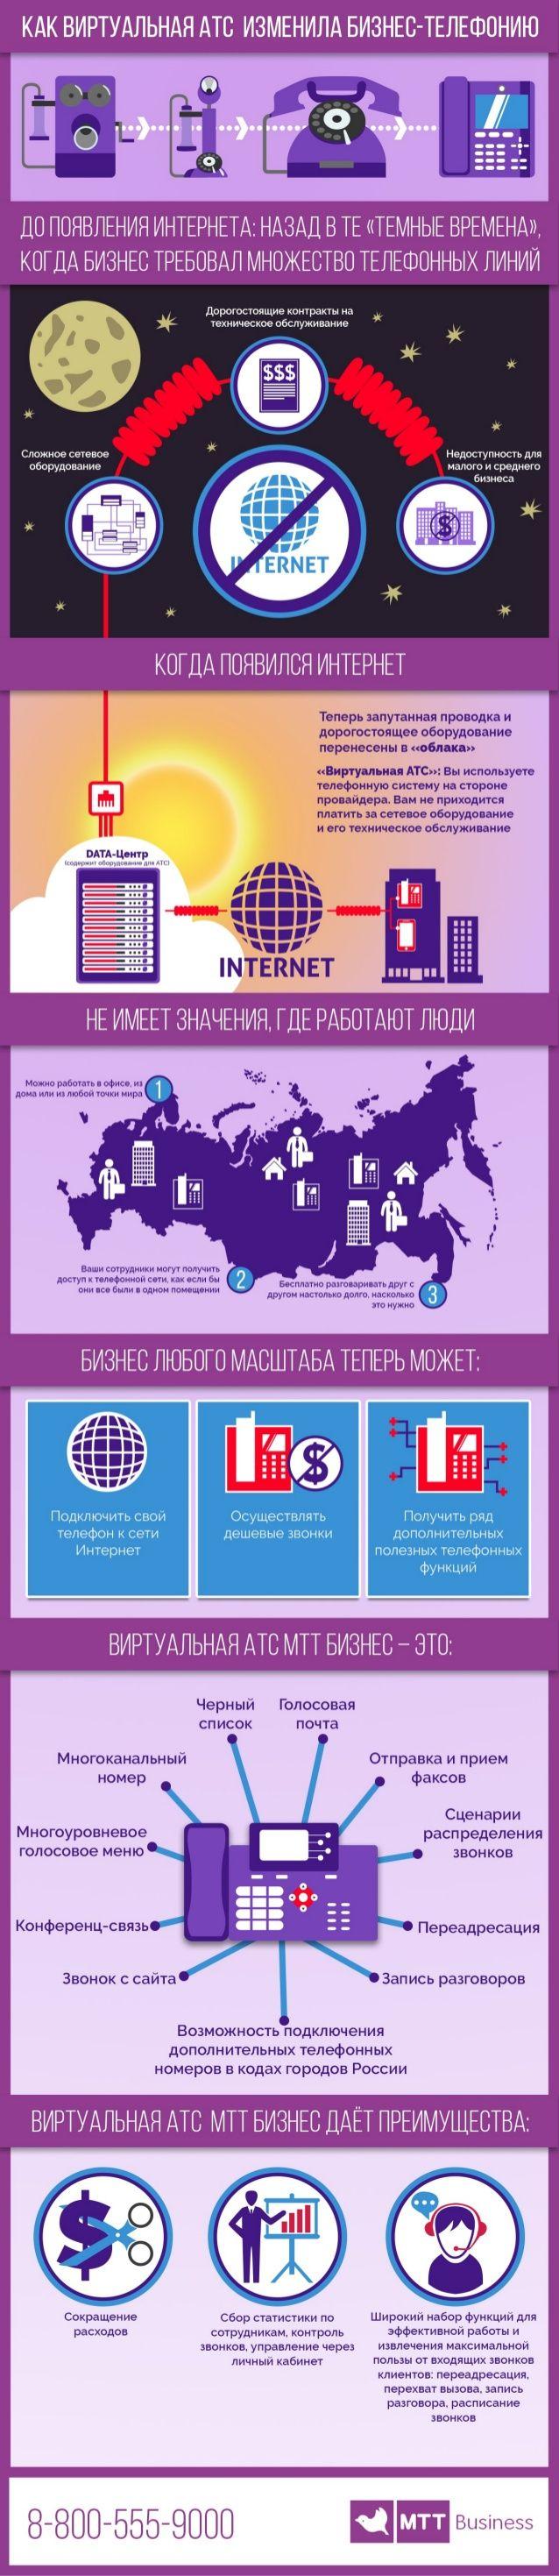 VOIP, IP-телефония, бизнес,  ВАТС, Виртуальная АТС, бизнес-телефония, айпи, ip http://www.slideshare.net/AllaNikolaeva1/ip-52476187